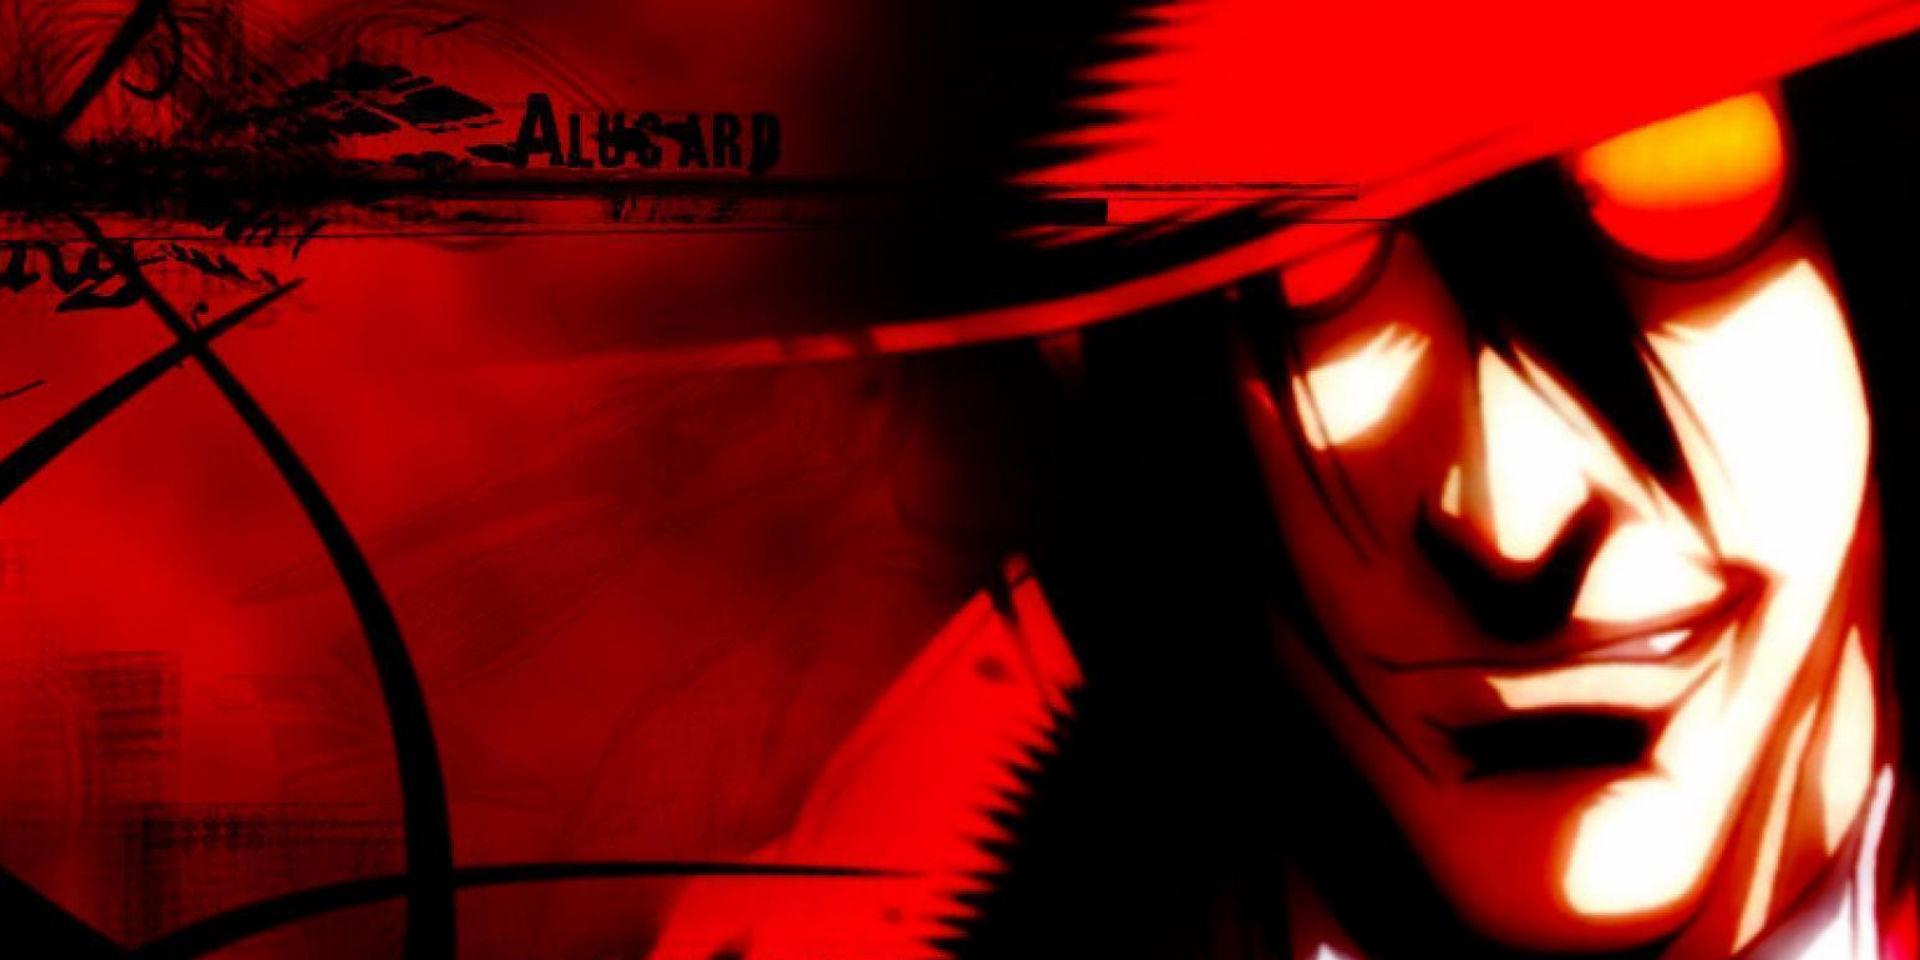 J-POP Hellsing - Nuova Edizione